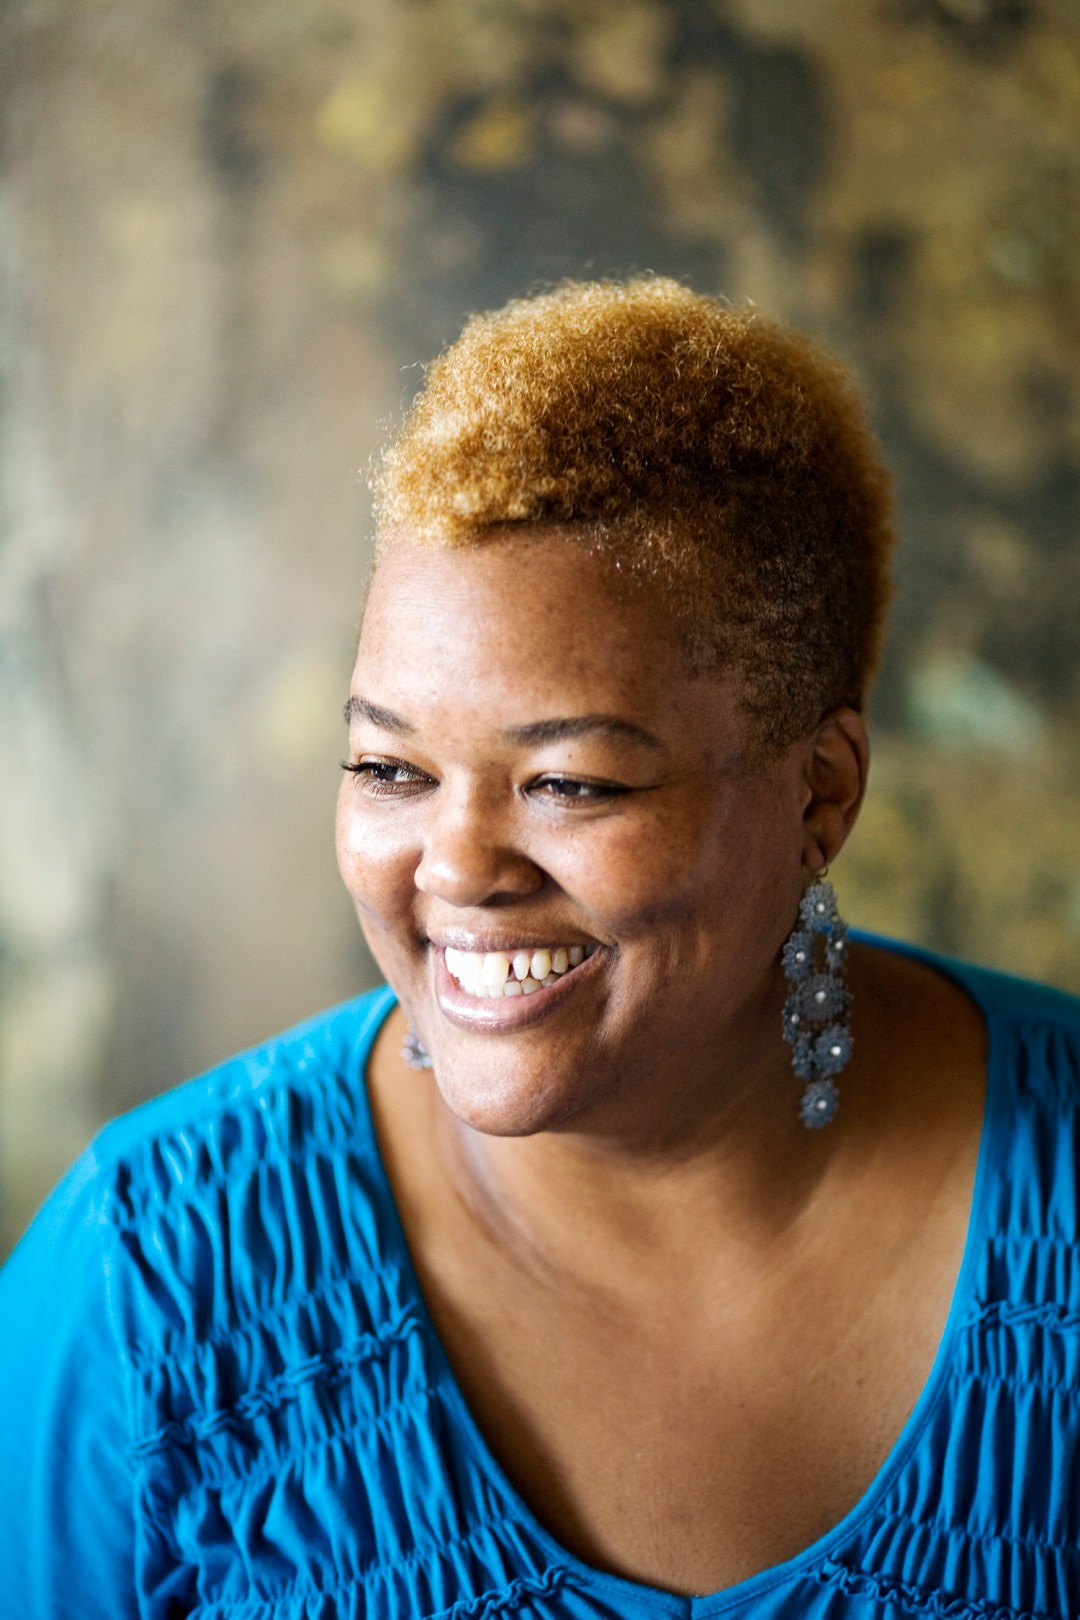 Stacy-Lynn-Waddell-1440x2160 10 Southern Black Women Artists to Watch from Expert Curator Jonell Logan